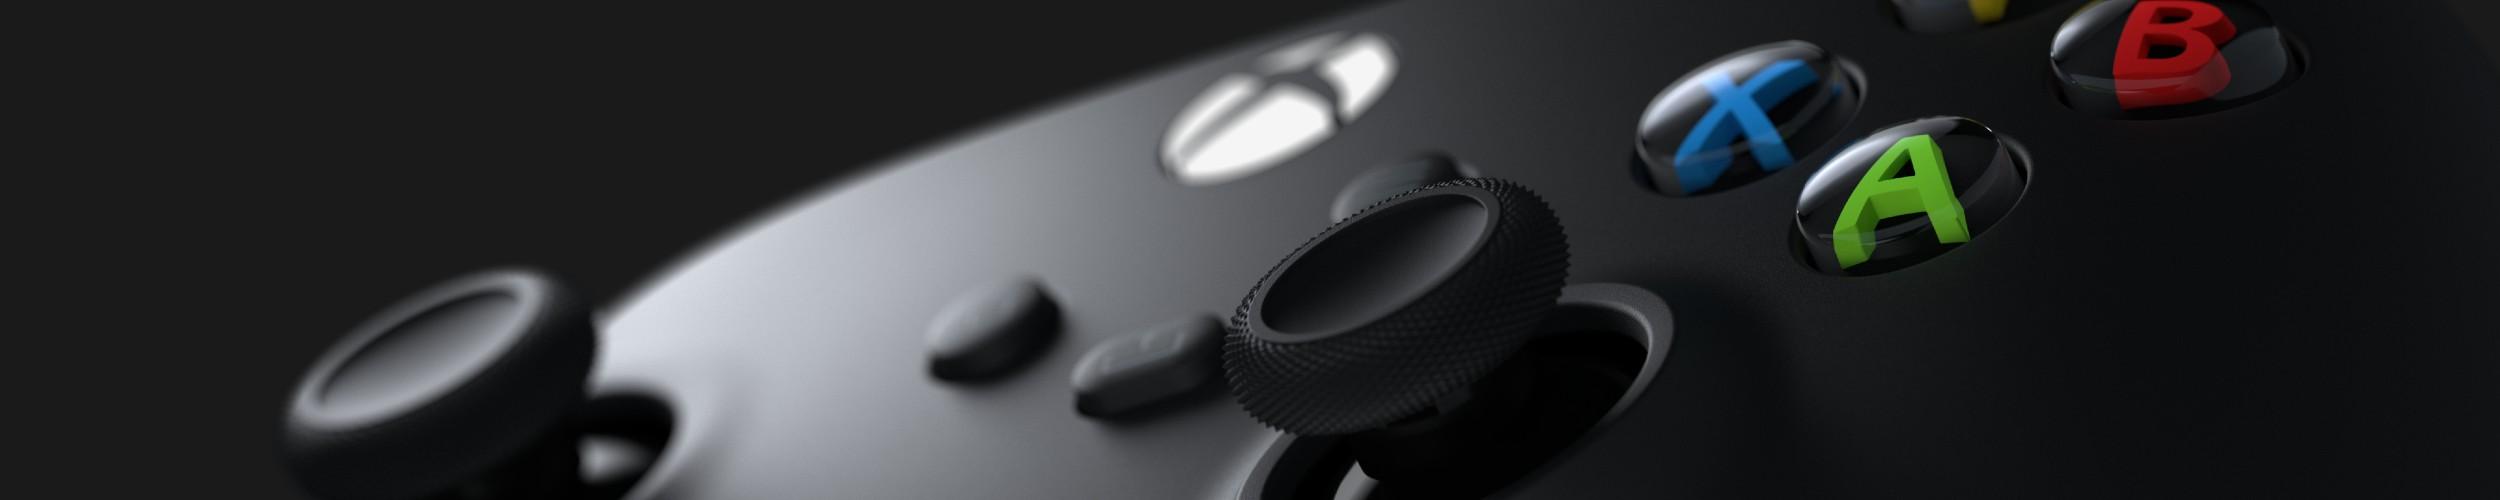 Xbox Series X Hero Banner